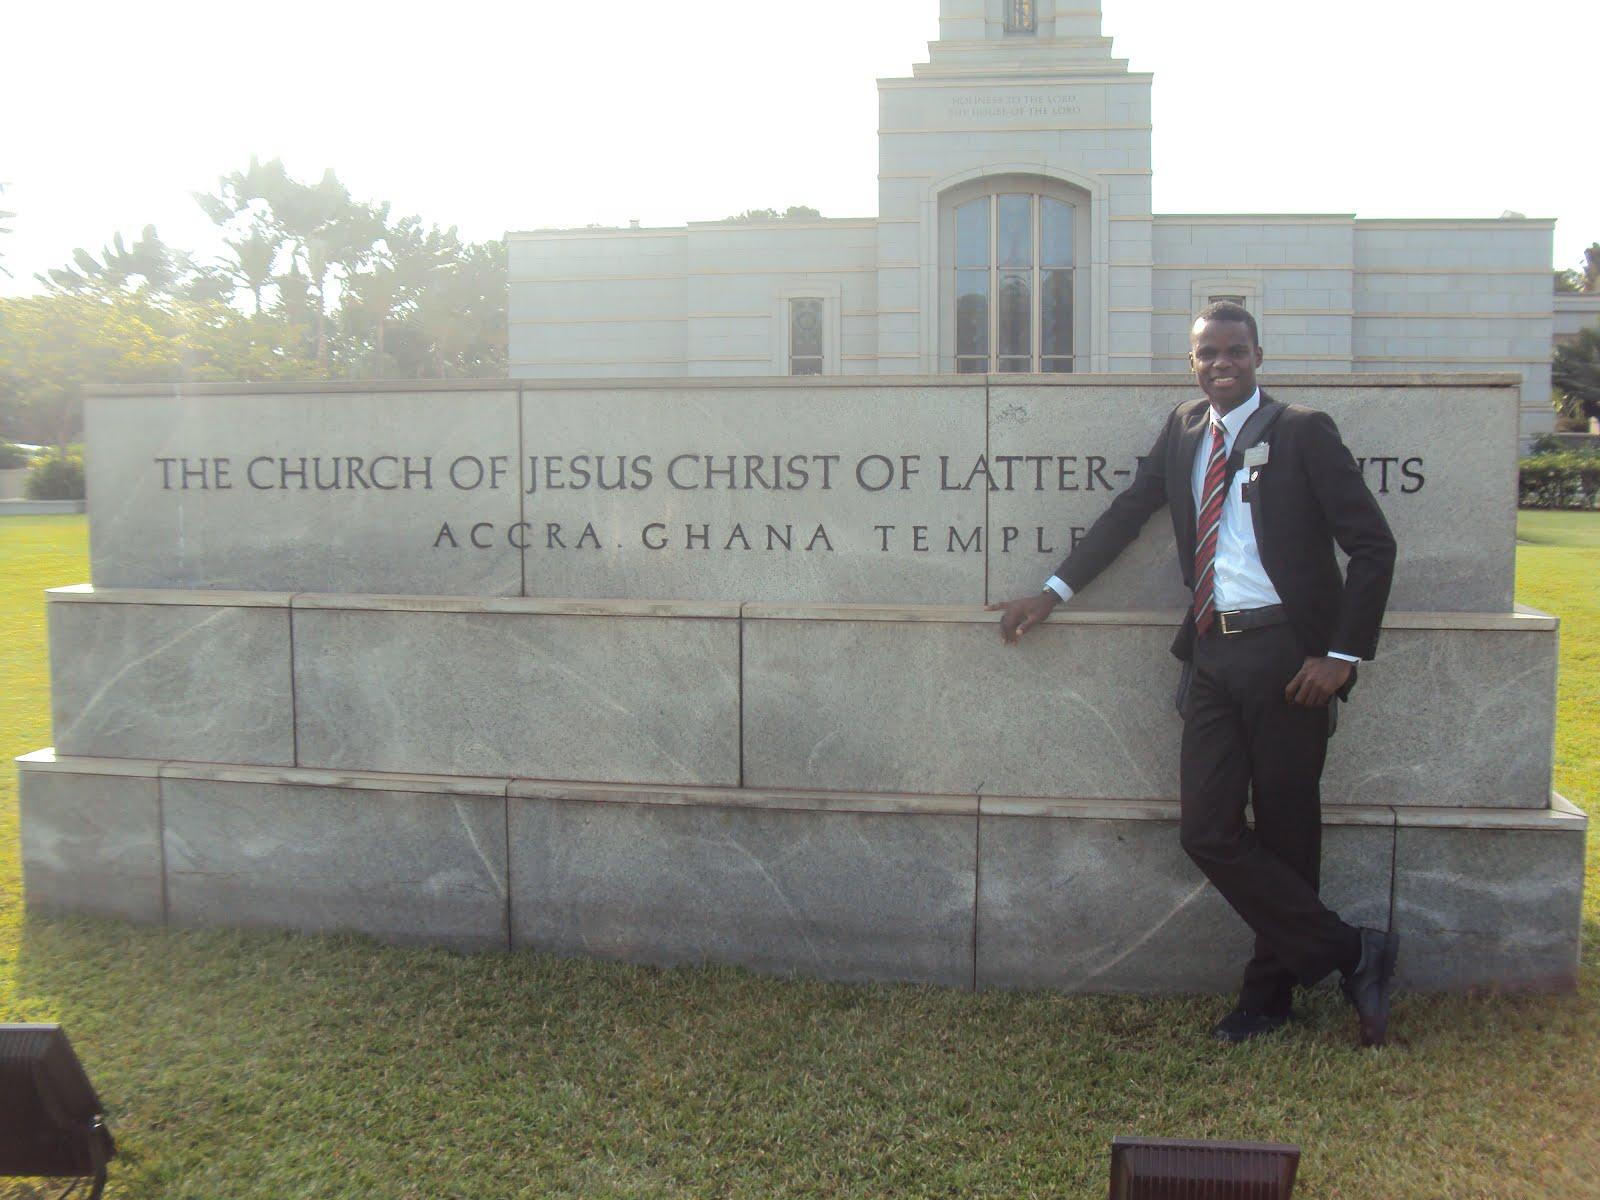 GHANA - ACCRA - TEMPLE